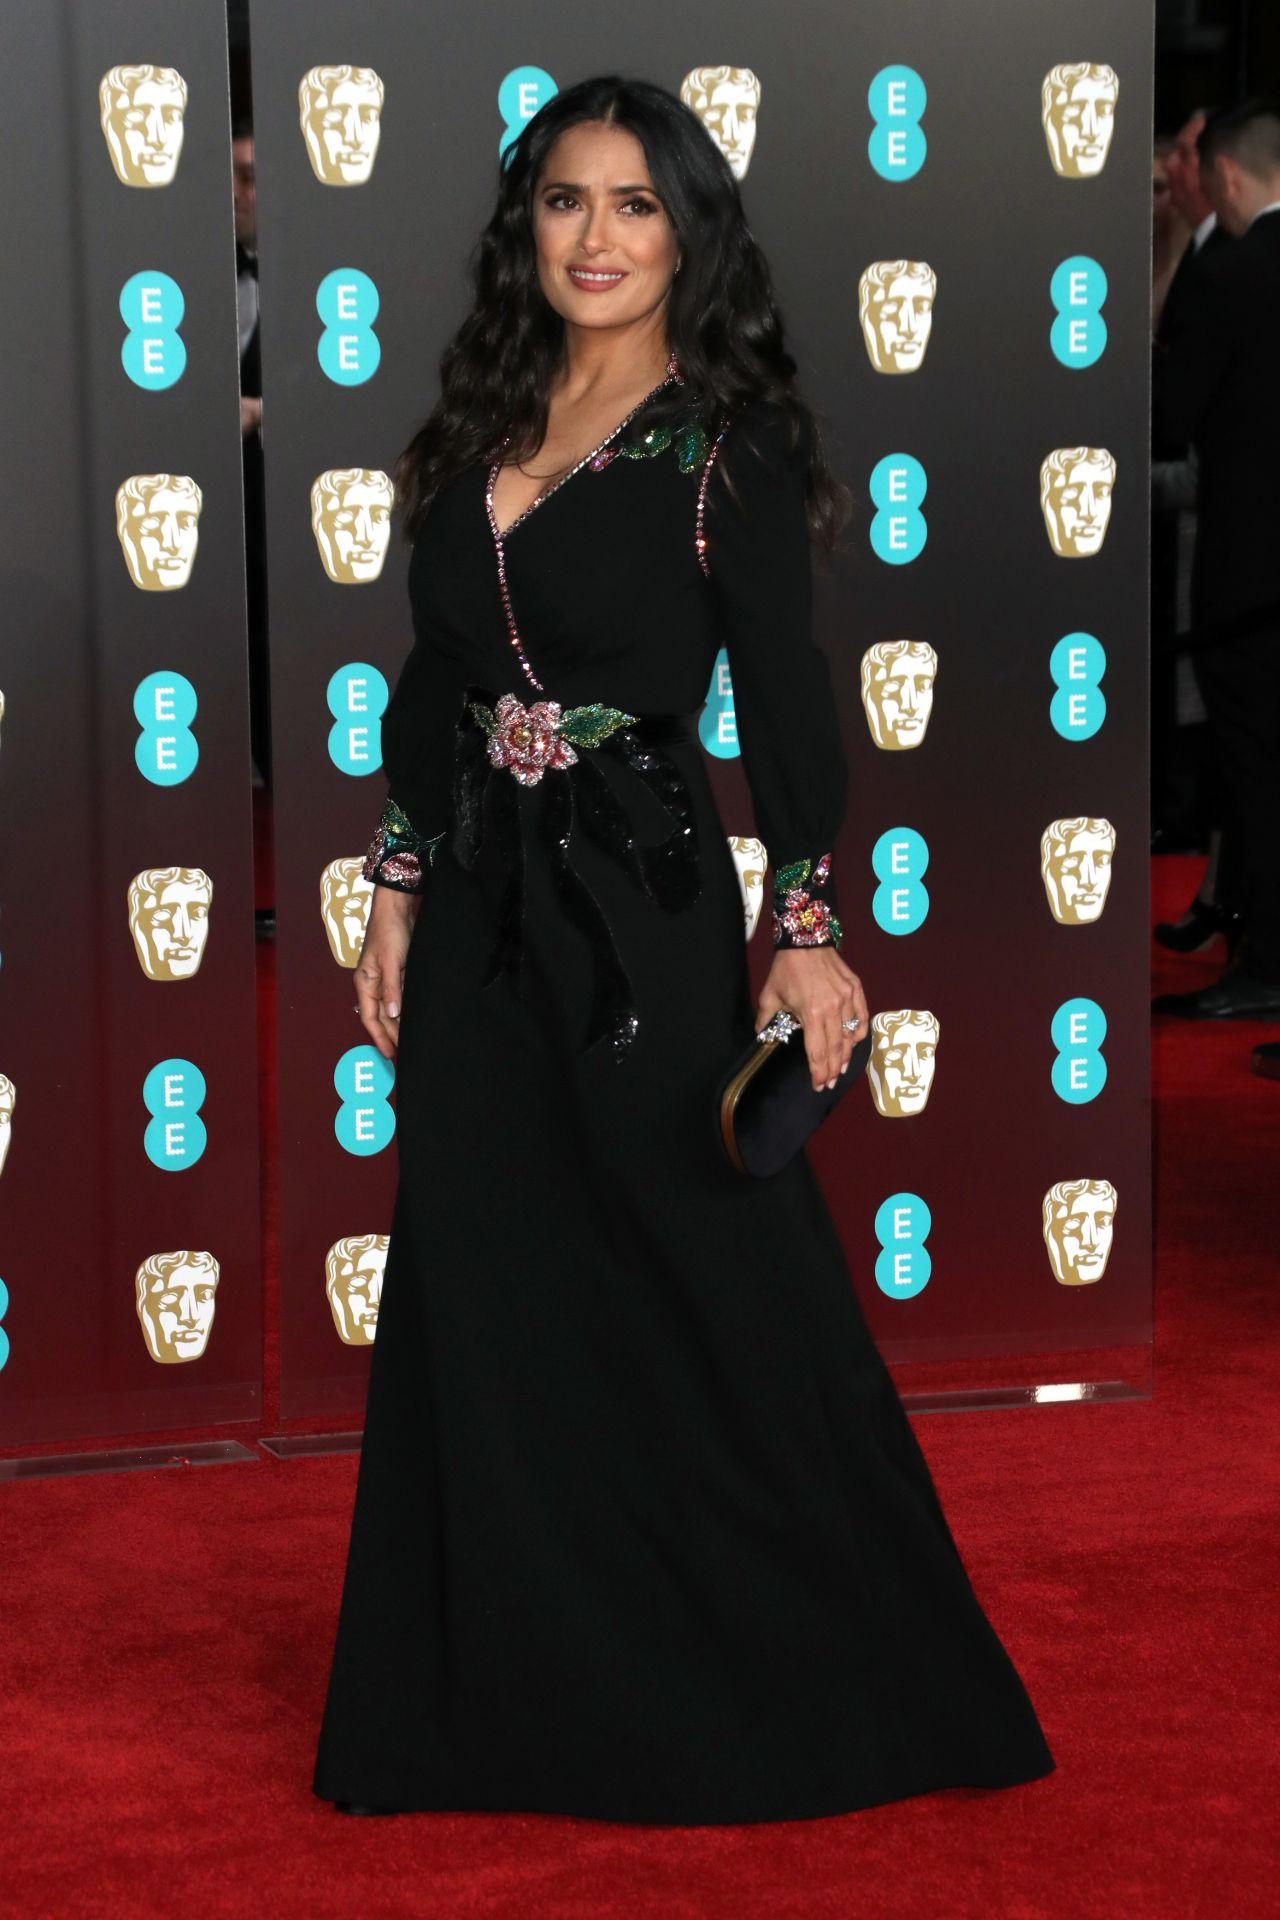 http://celebmafia.com/wp-content/uploads/2018/02/salma-hayek-2018-british-academy-film-awards-12.jpg